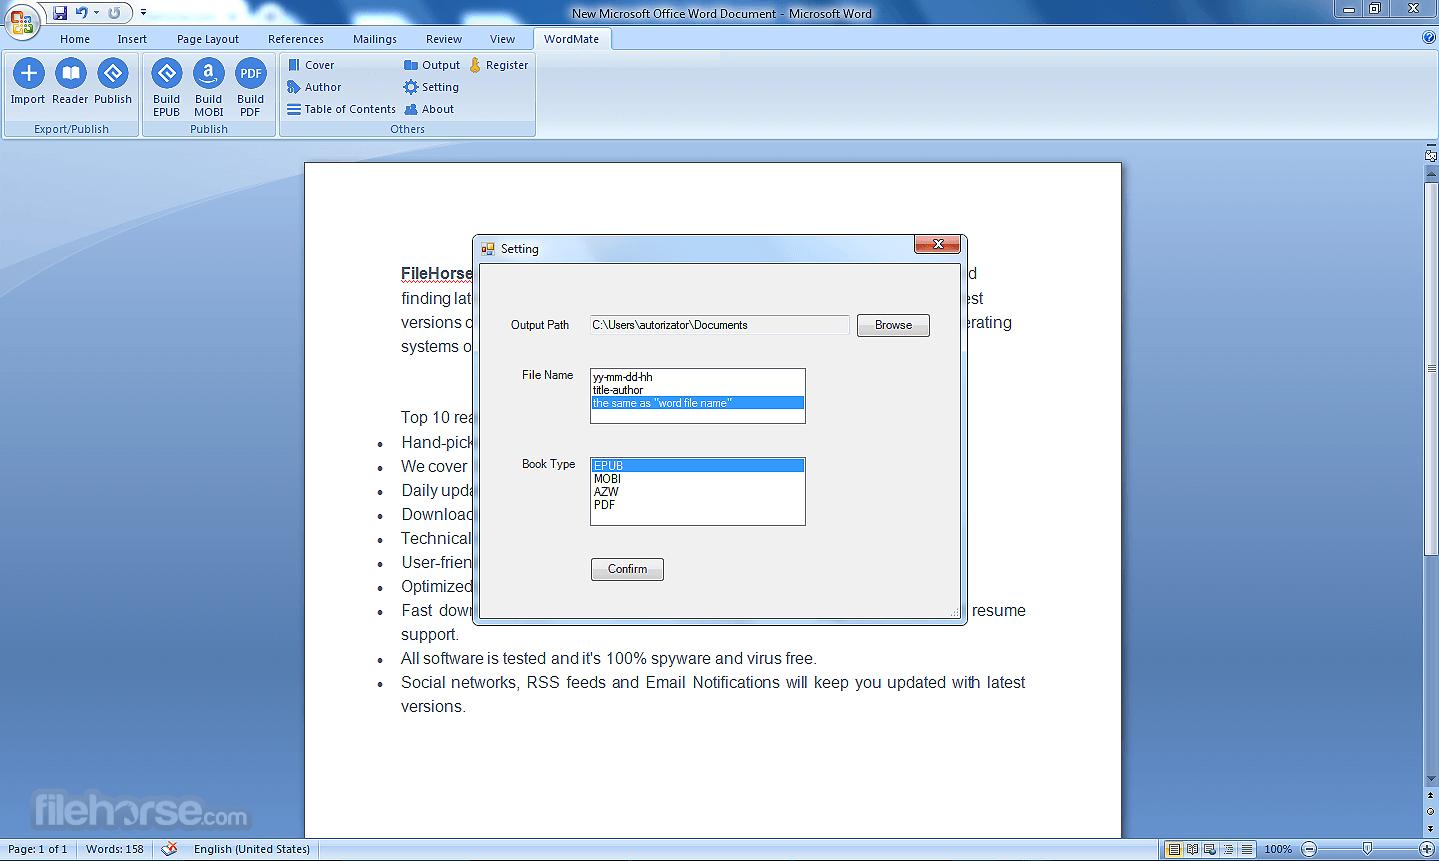 WordMate 1.0.1.48 Screenshot 3